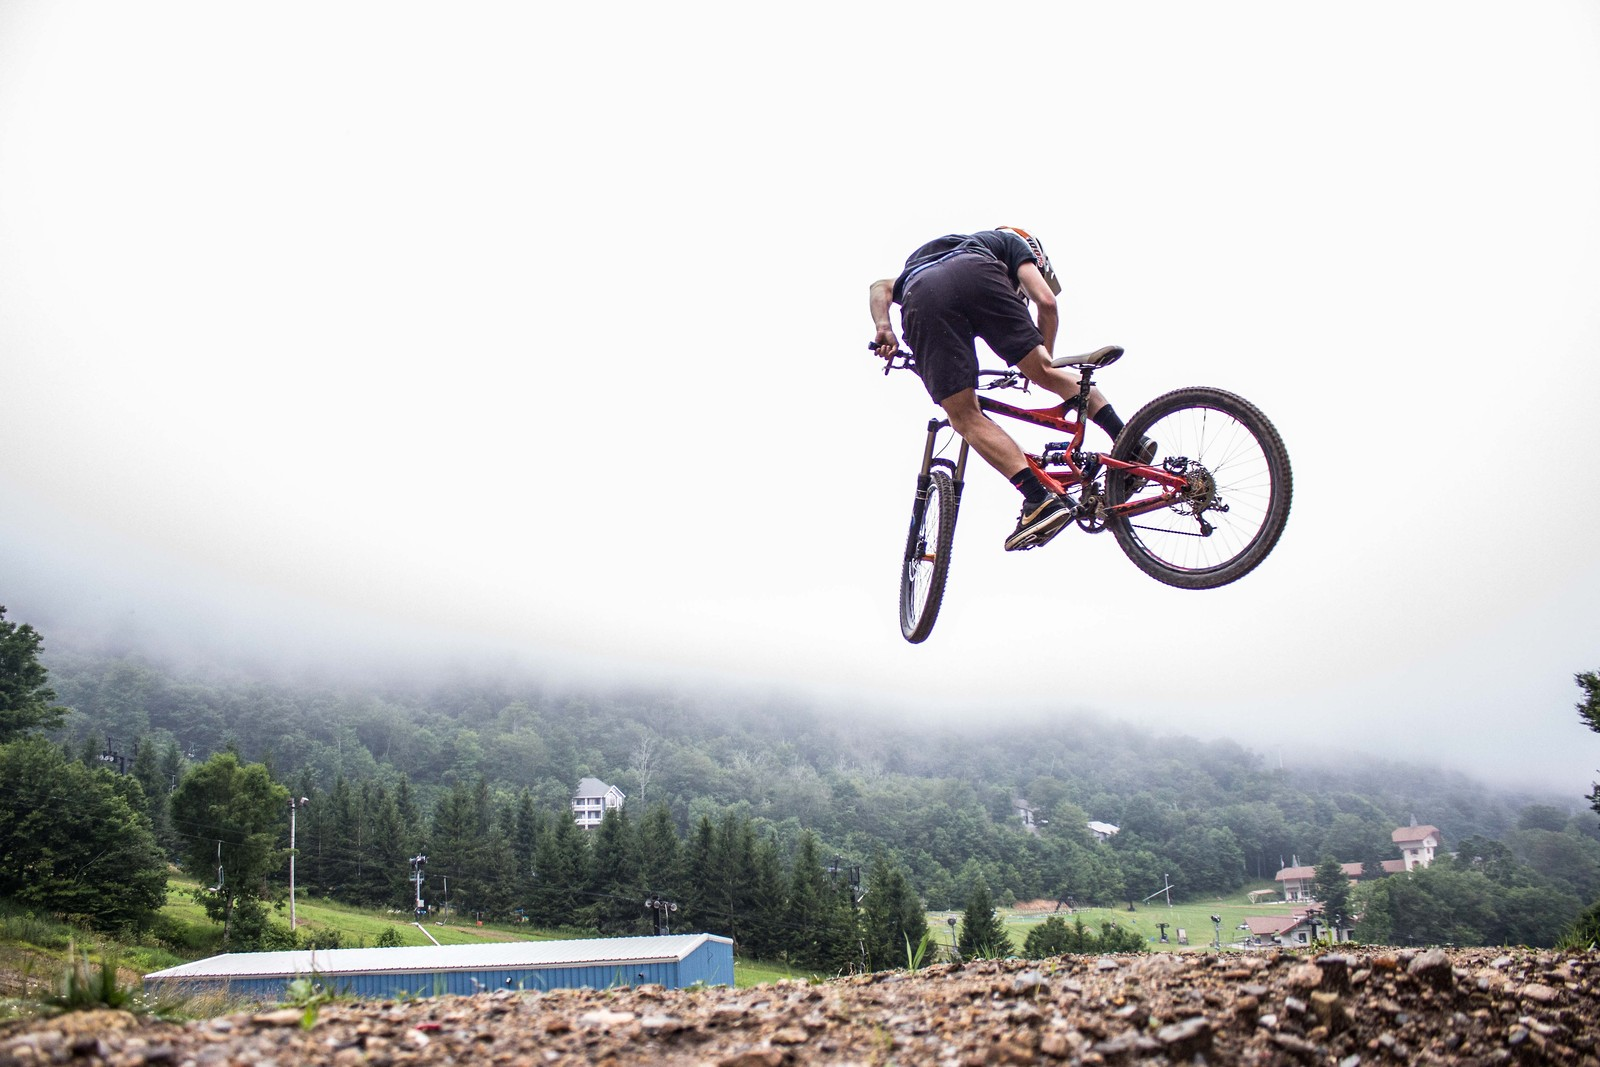 IMG 3975 - mtndrew - Mountain Biking Pictures - Vital MTB